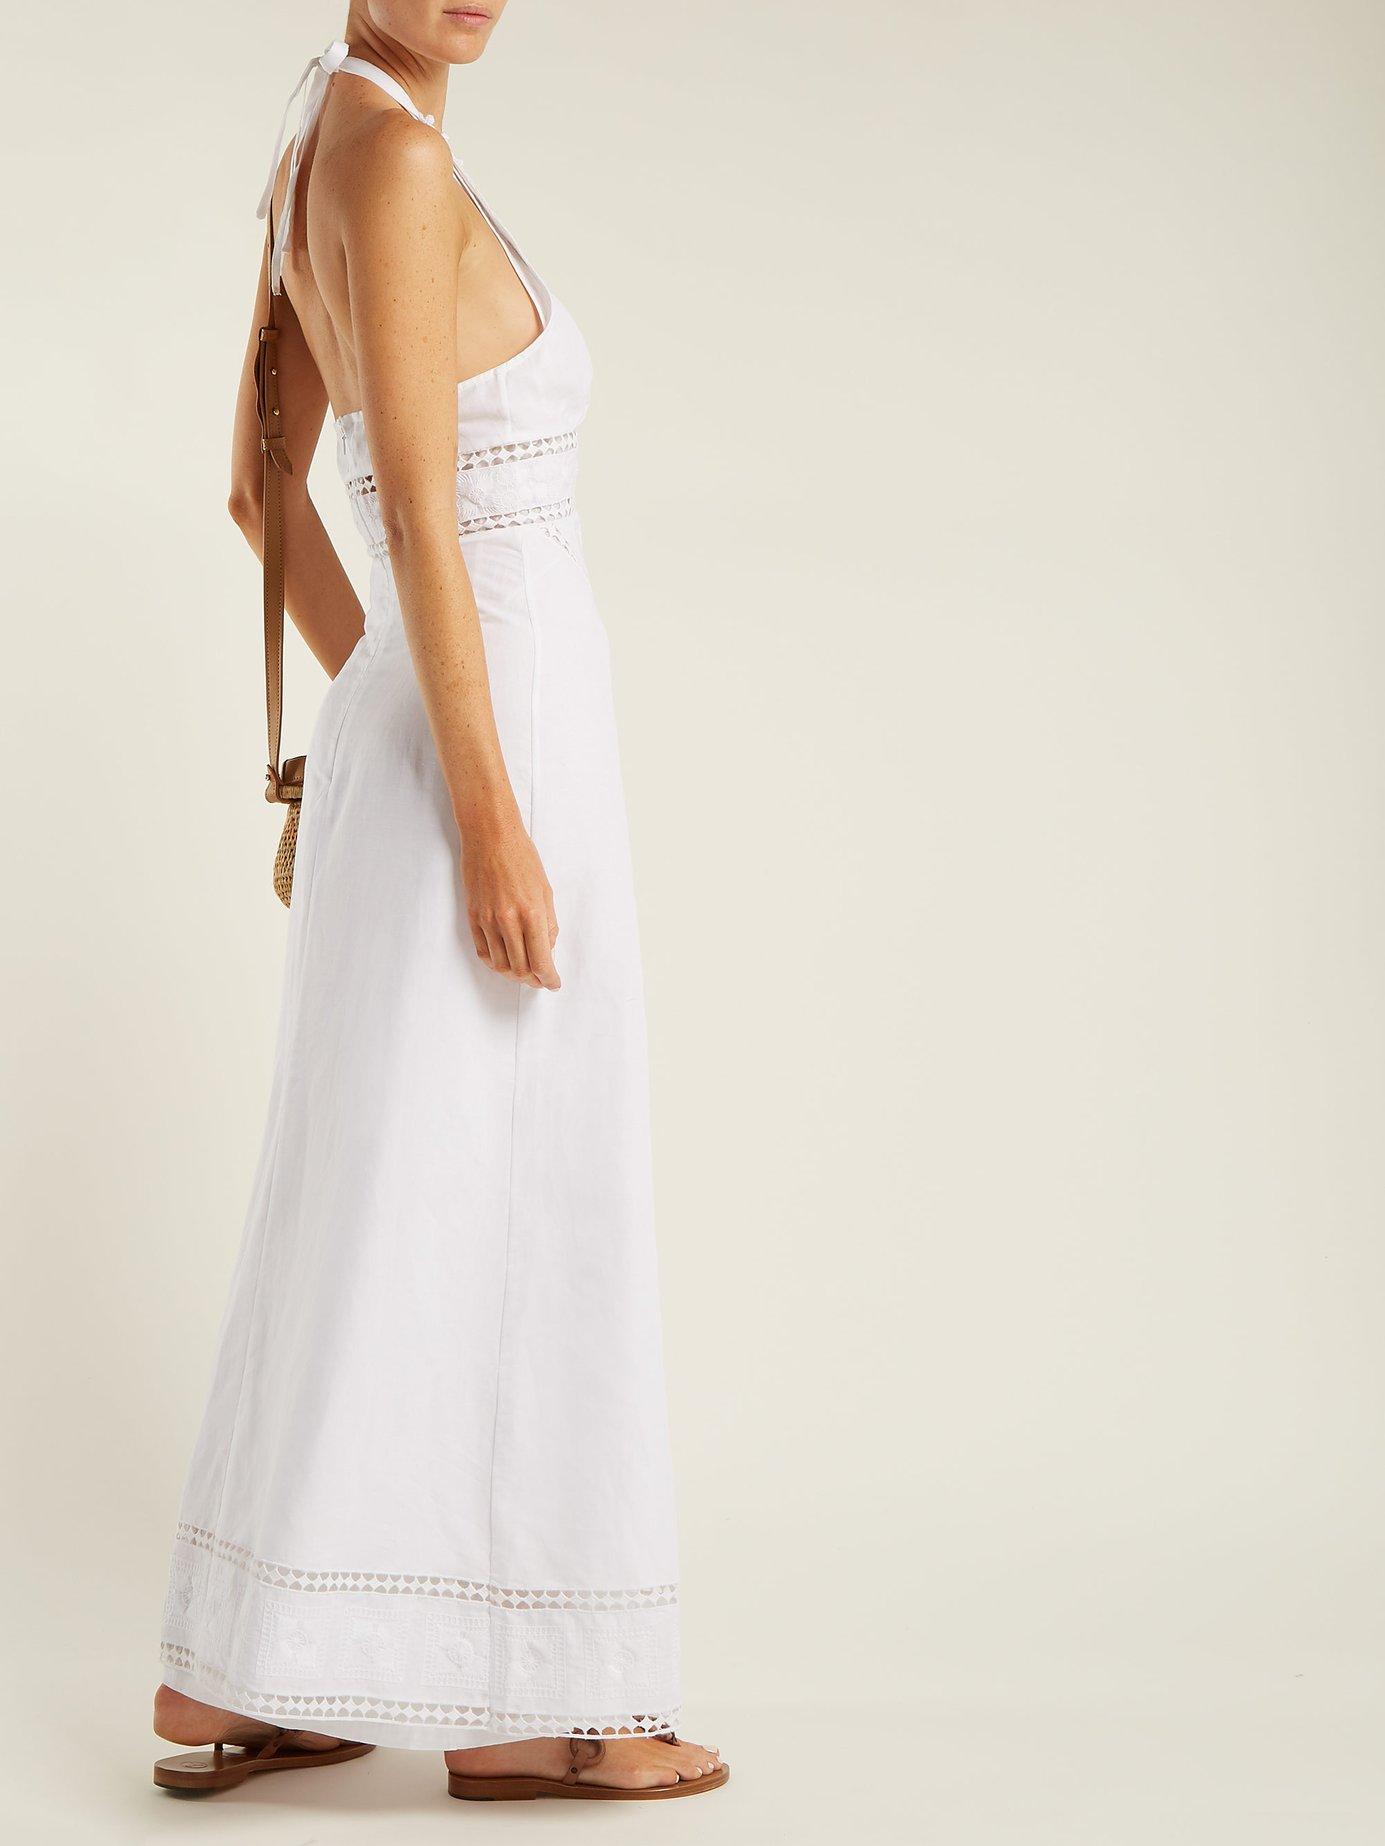 White lace-insert halterneck dress by Talitha